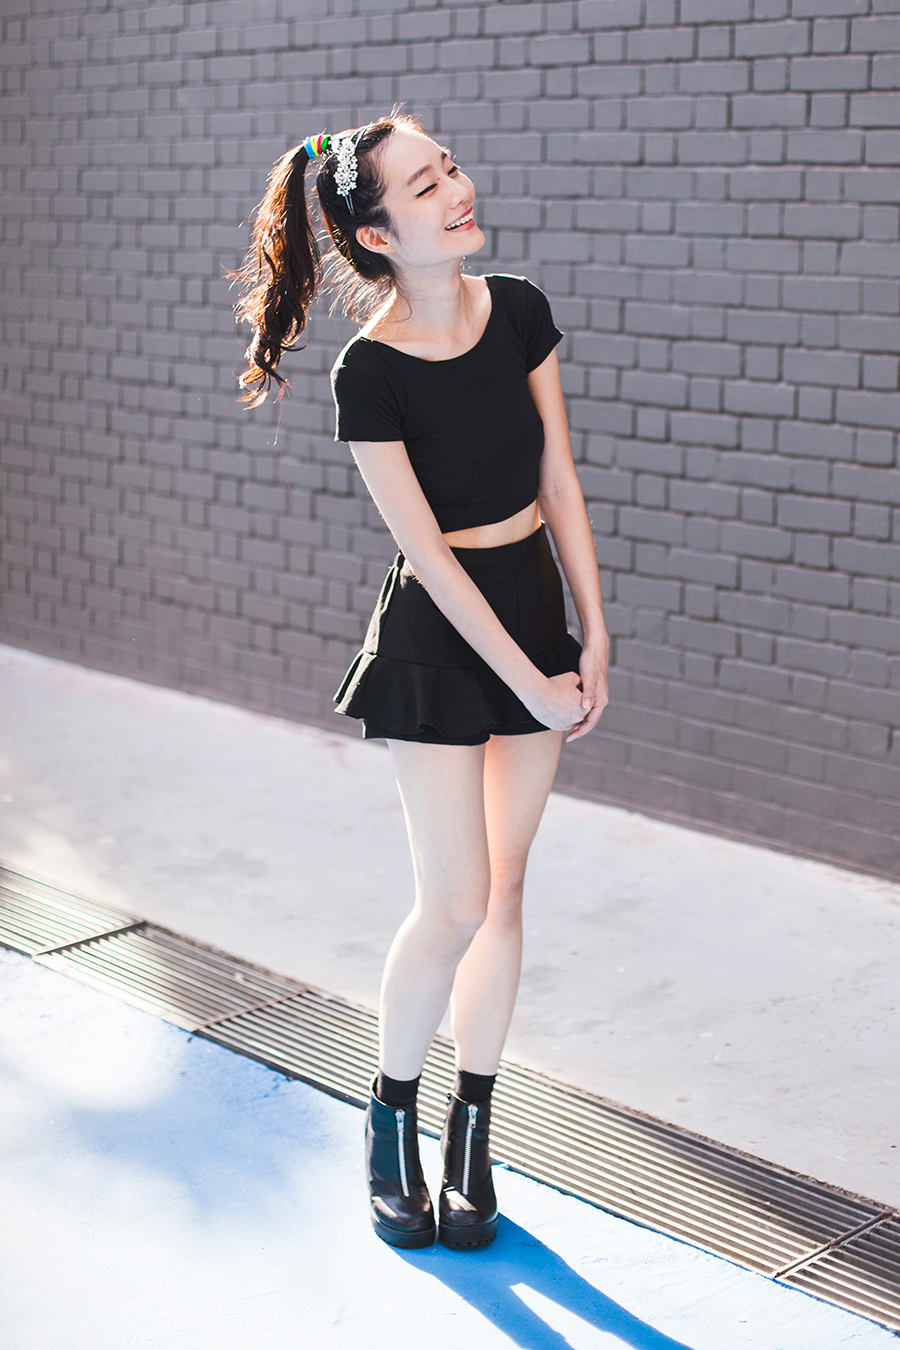 Irresistible Me Isis Headband outfit: DressLink black crop top, black culottes from Bangkok, black crew socks from Taobao, Rubi black platform boots via Zalora, multicolor hair ties from Luxola.